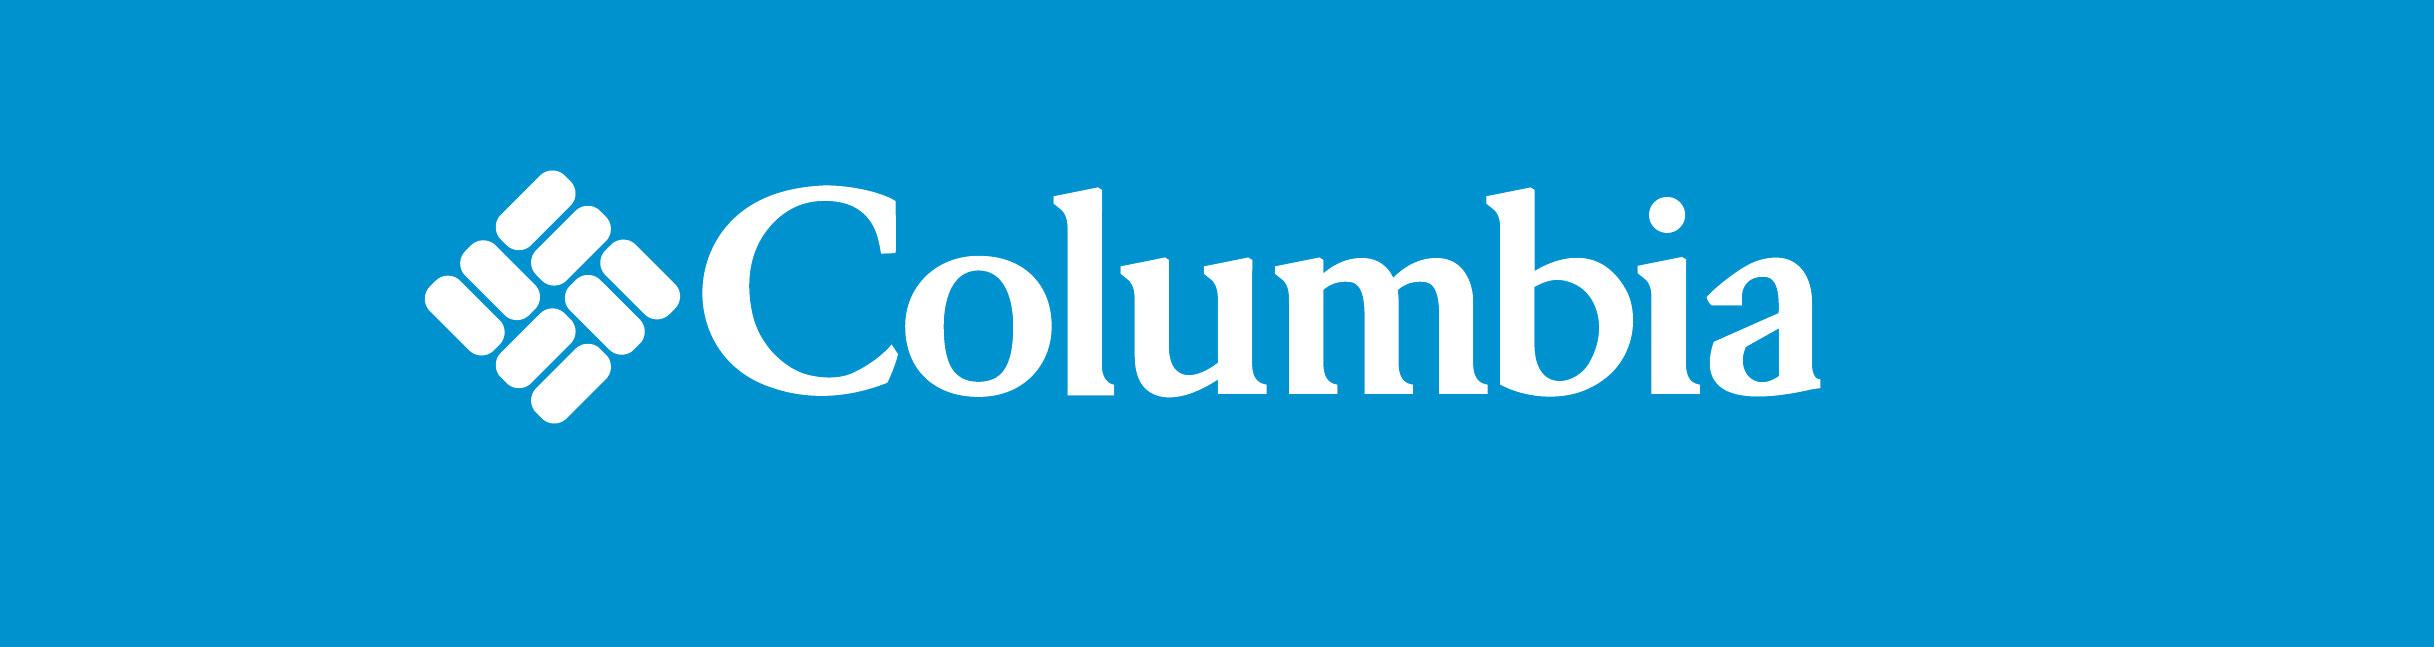 columbia_11_03_2015.jpg